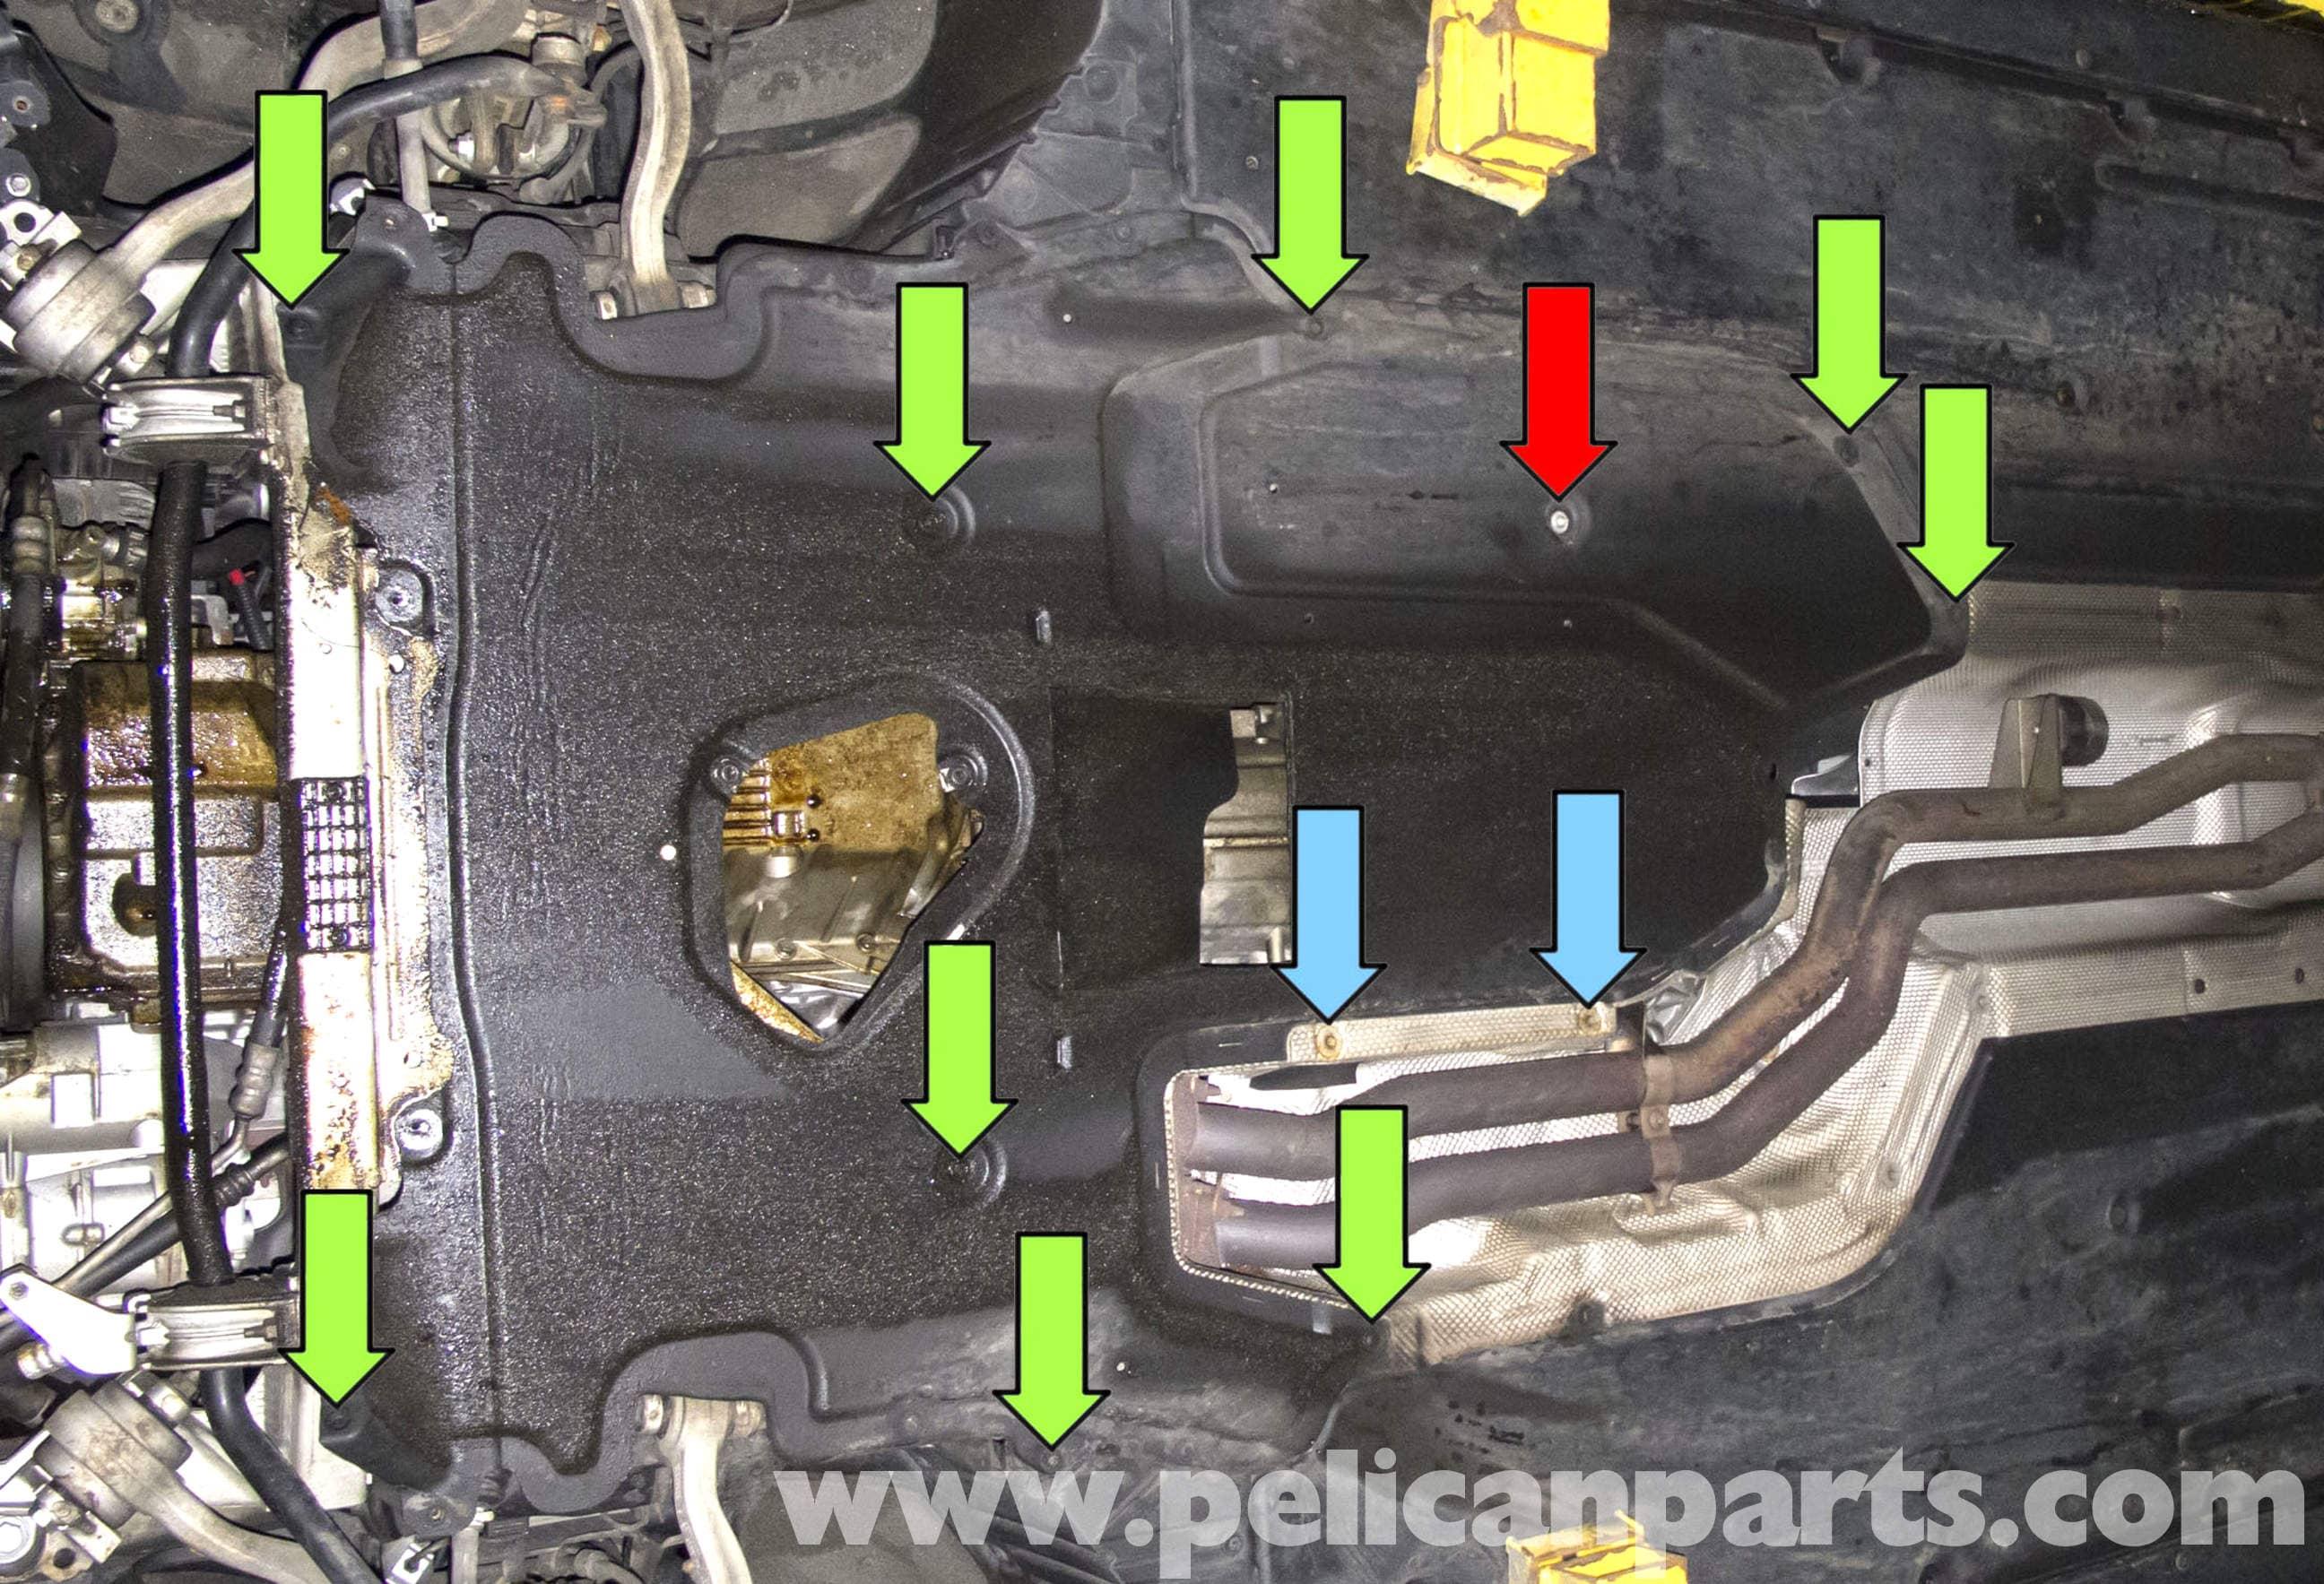 2006 330xi Fuse Diagram Bmw E60 5 Series Engine Transmission Splash Shield Removal